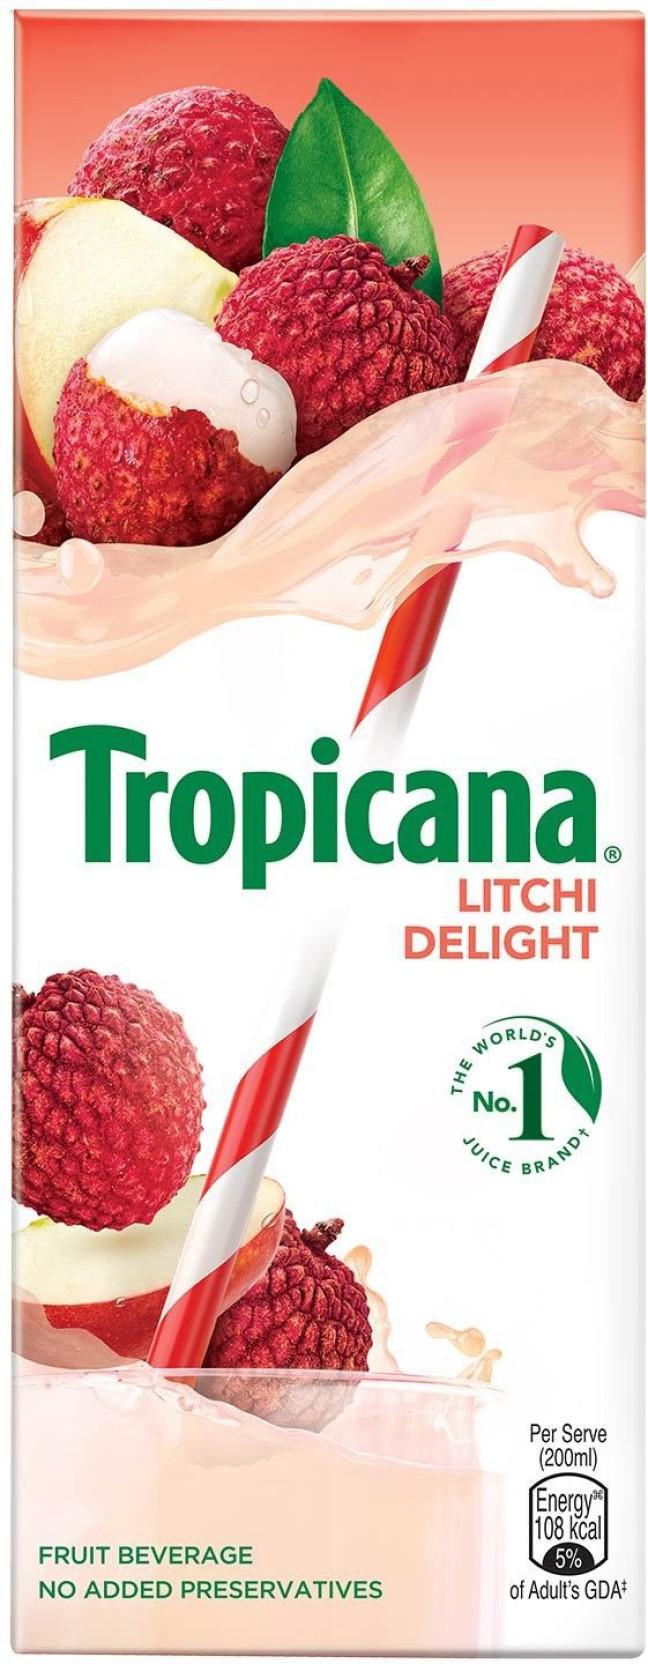 Tropicana Litchi Delight Fruit Beverage 200 ml